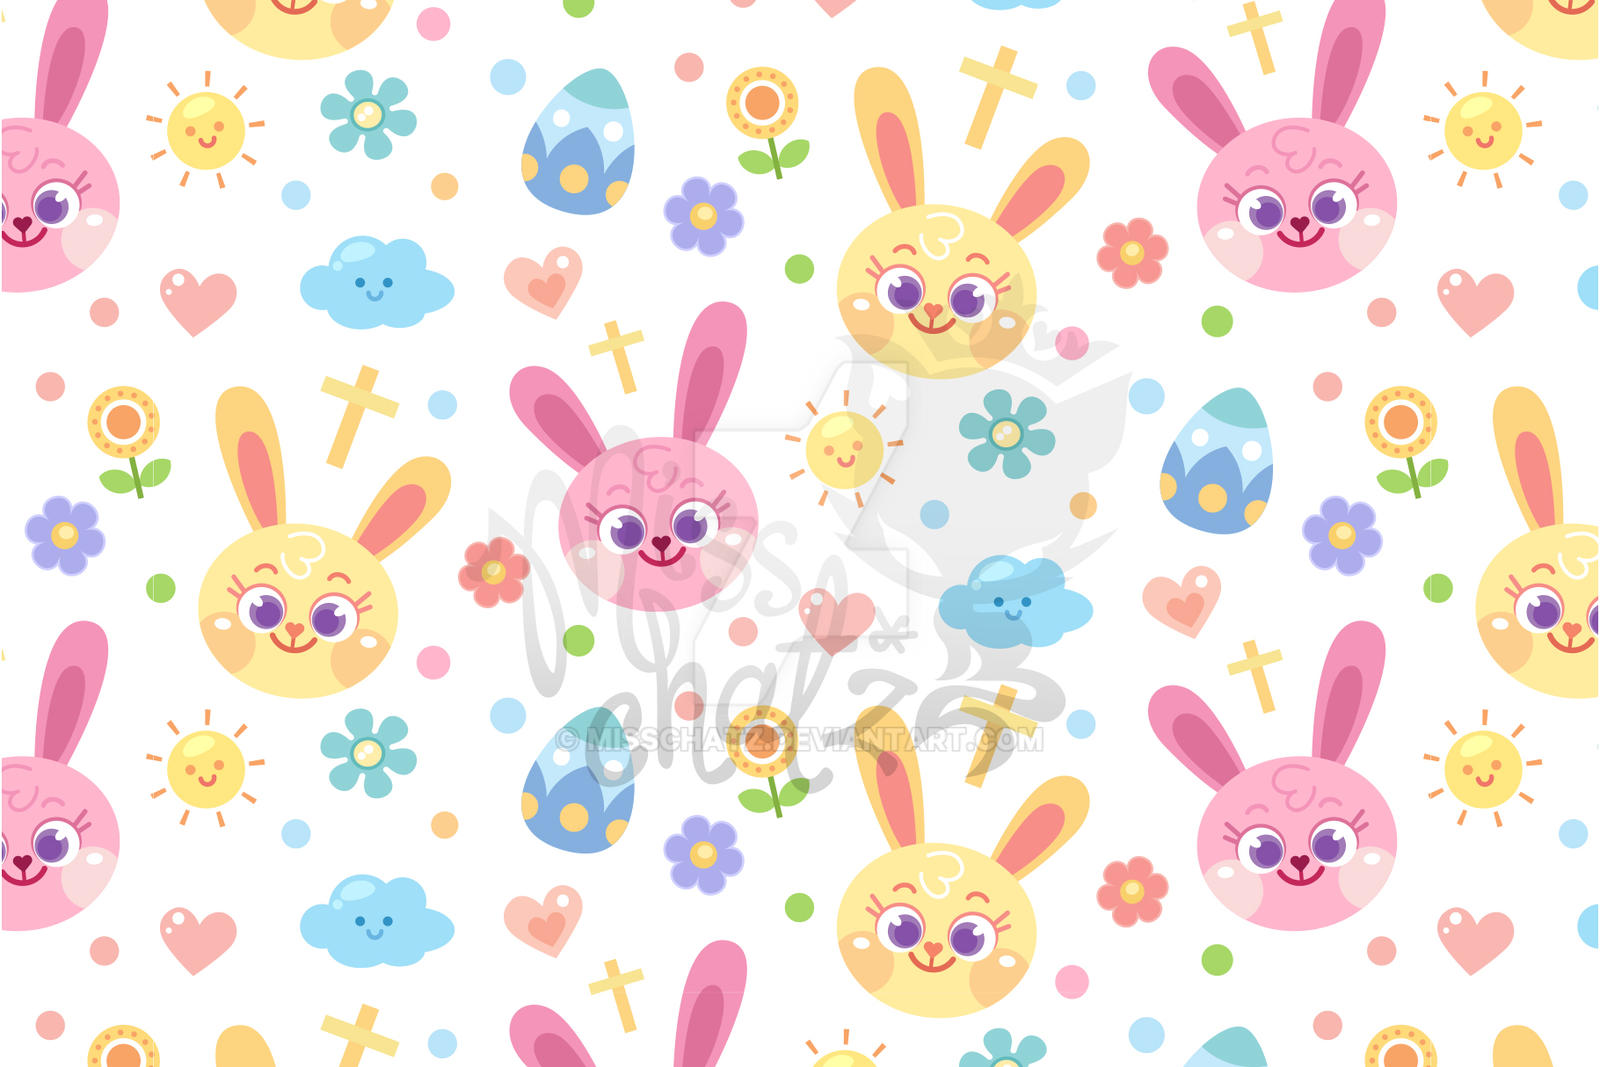 Pastel Easter Bunny Seamless Pattern by MissChatZ